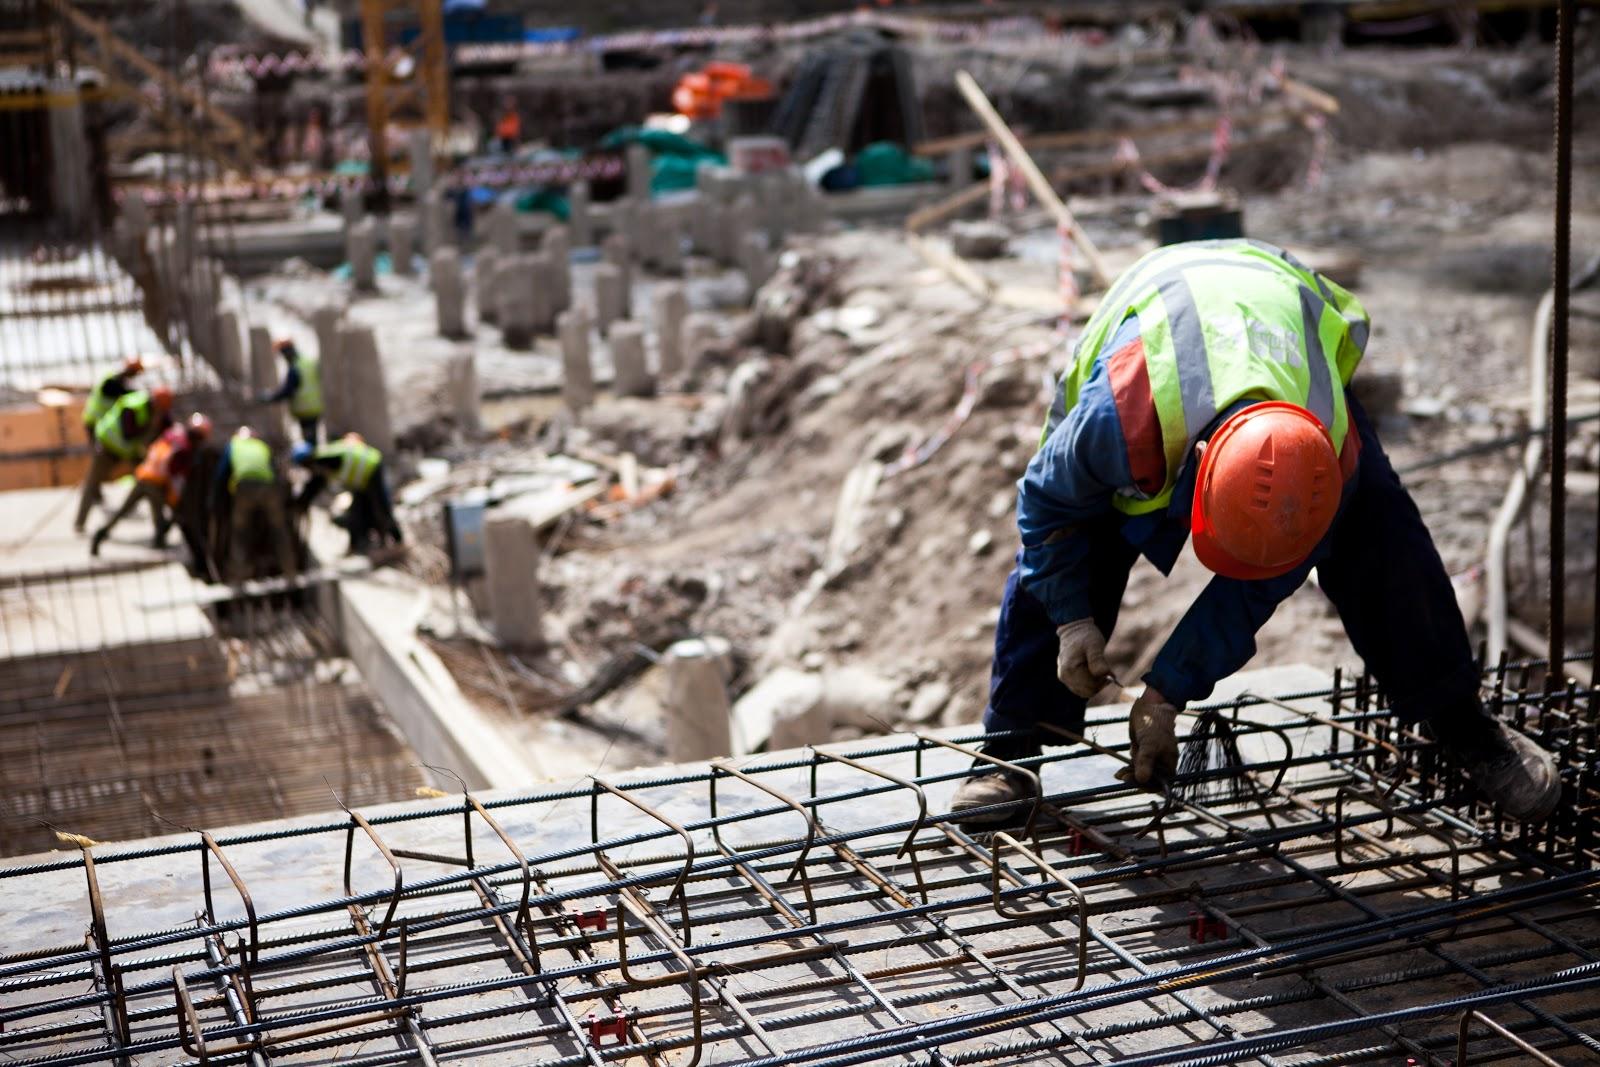 Cum se construiesc in prezent casele cu zidarie confinata?